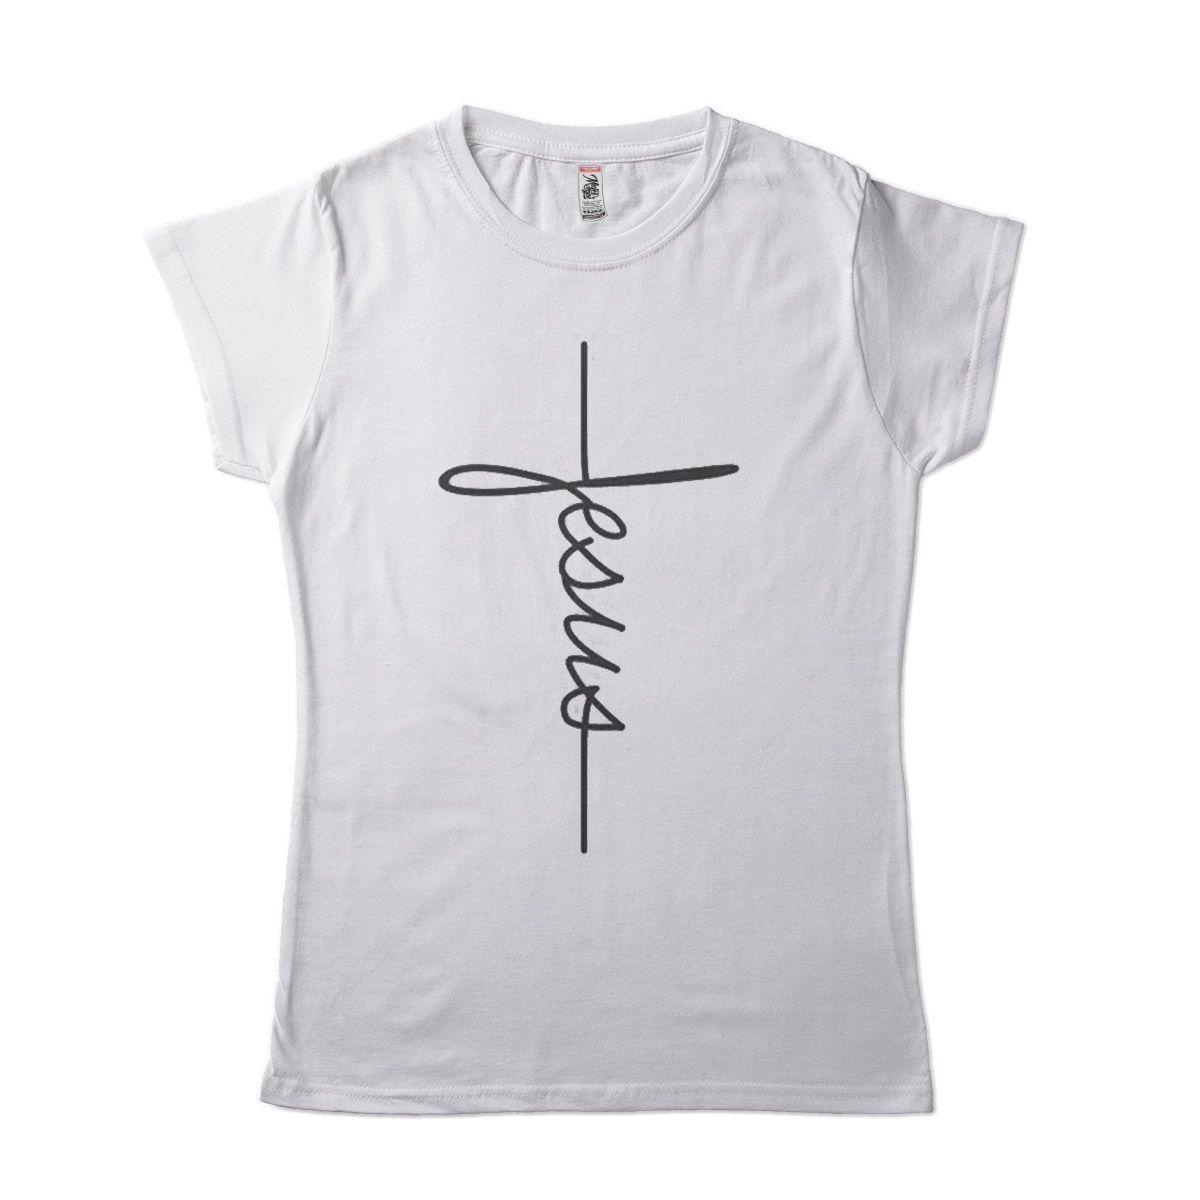 Camiseta Feminina Religiosa Jesus Escrito Na Cruz Algodao